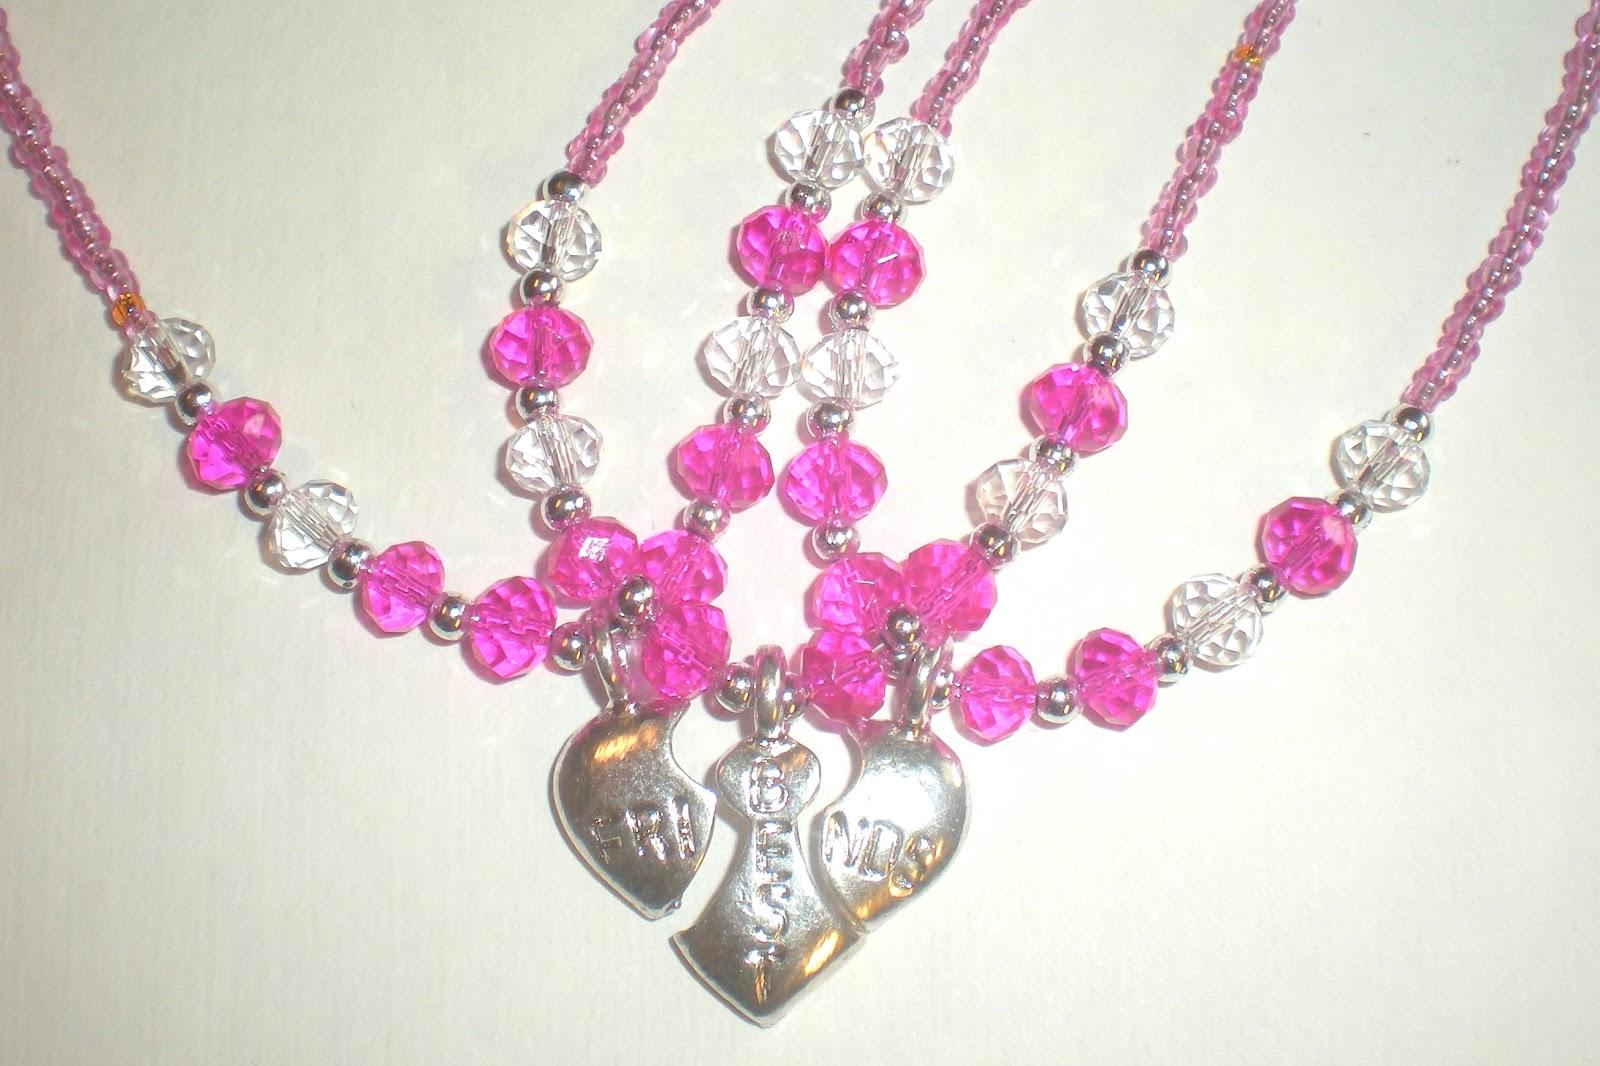 charm gurlz charms for best friends necklaces